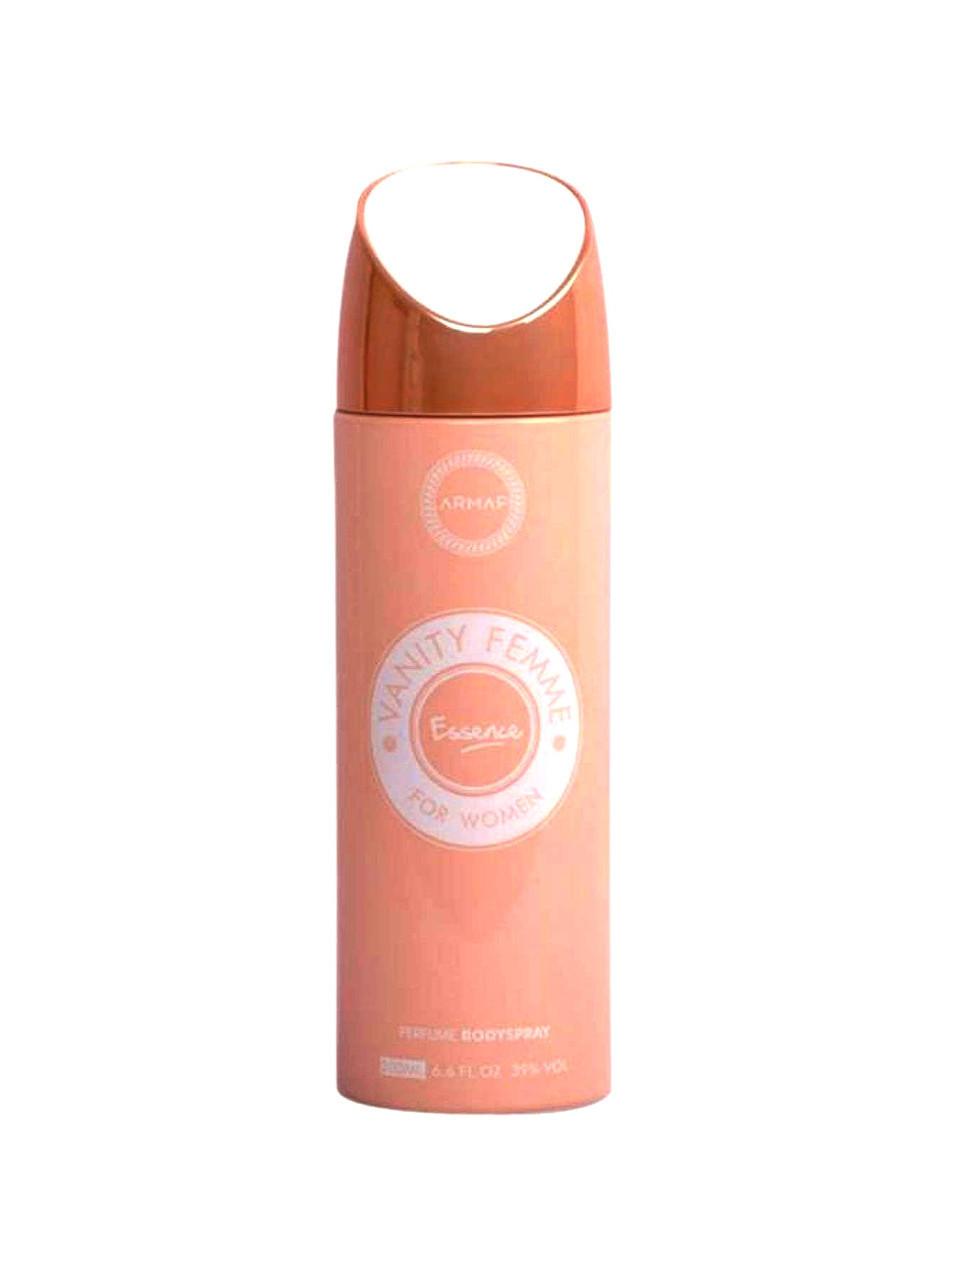 Vanity Femme Essence for her Body Spray 200 ml